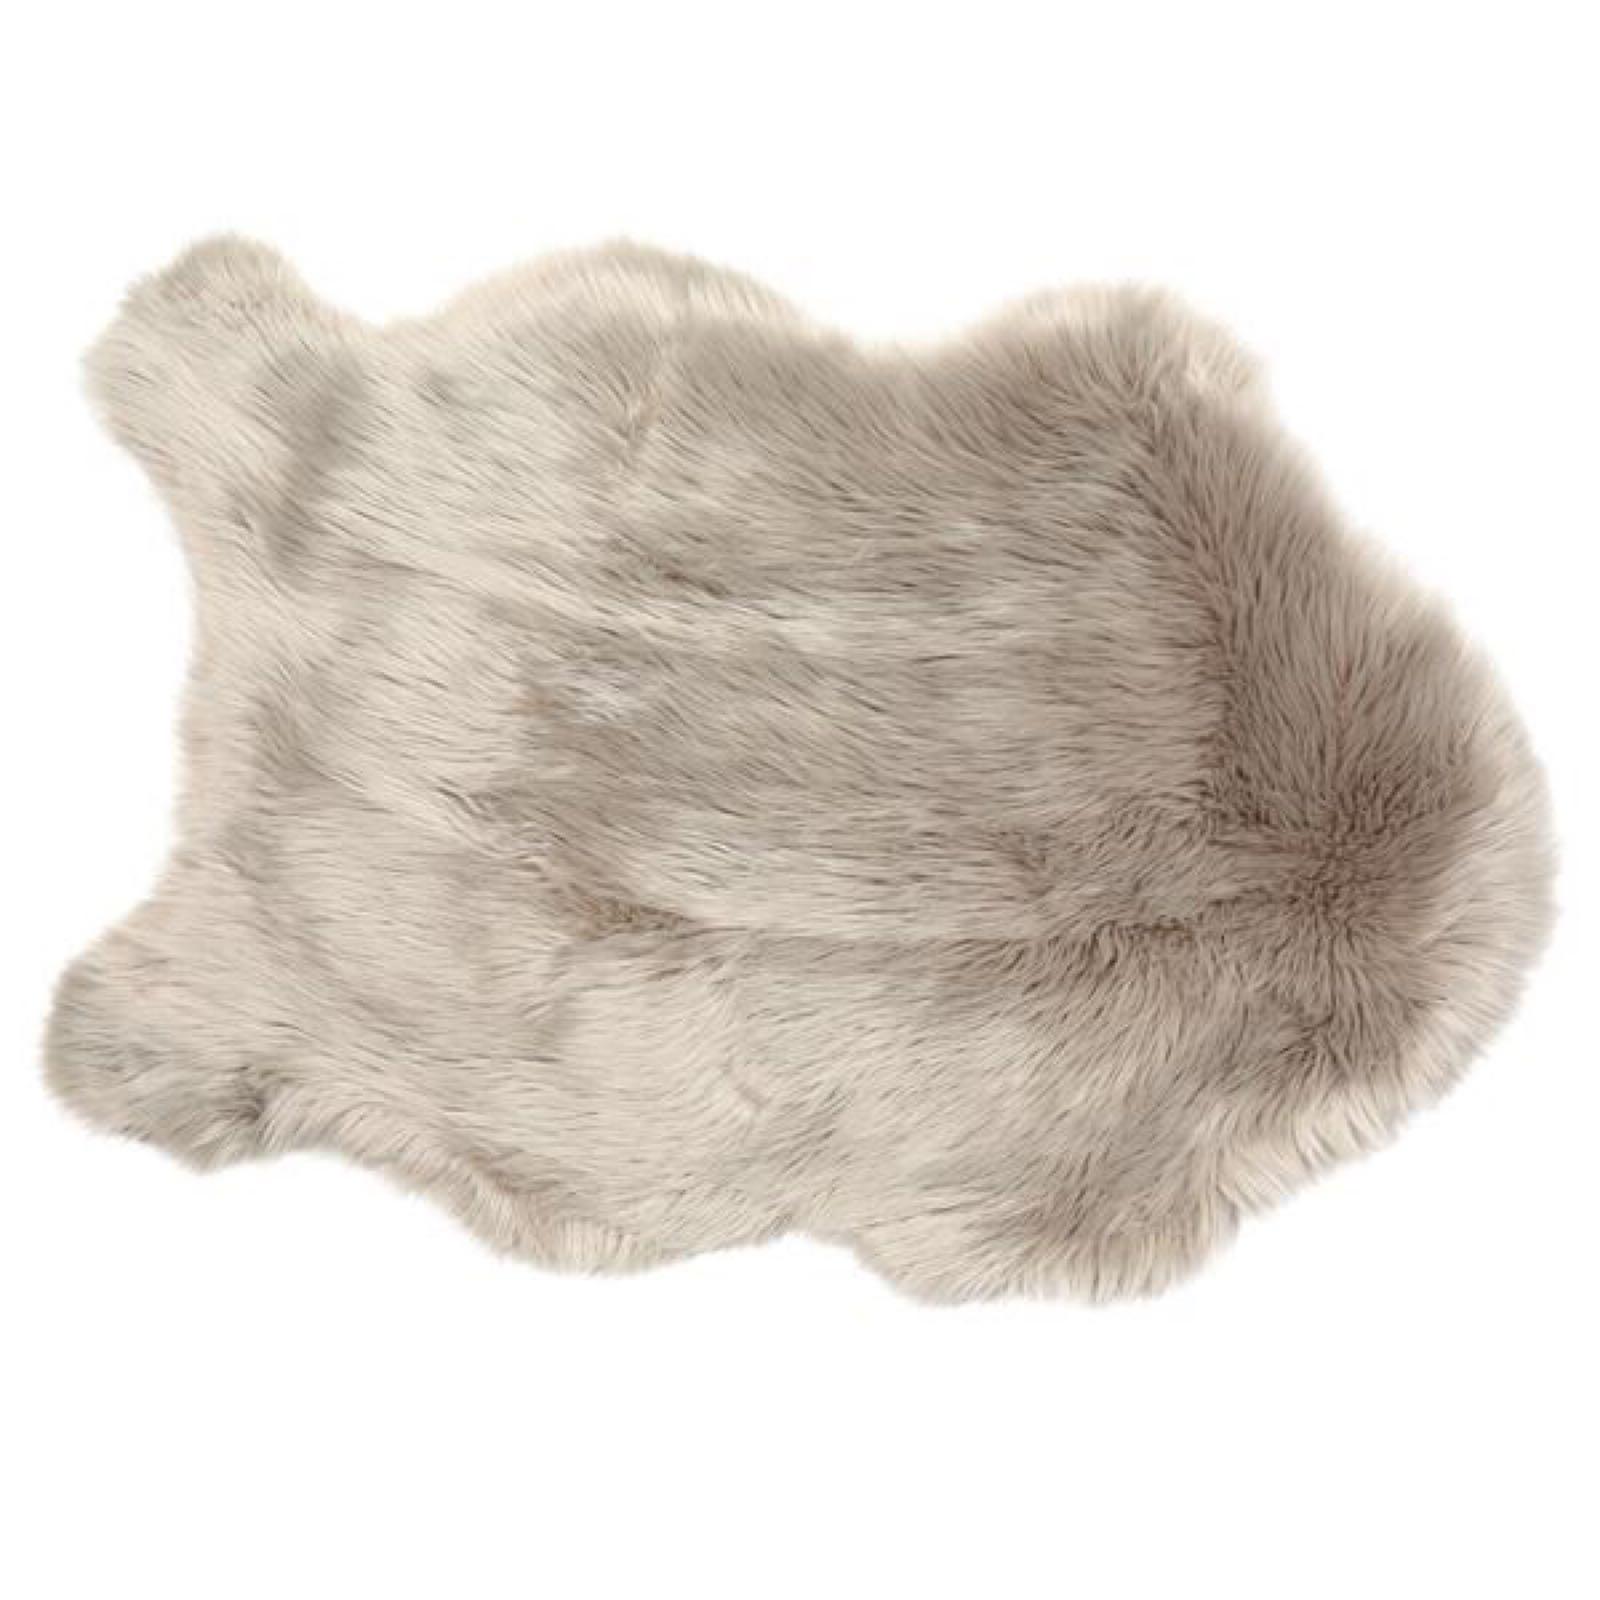 Faux Sheepskin Rug -  Taupe